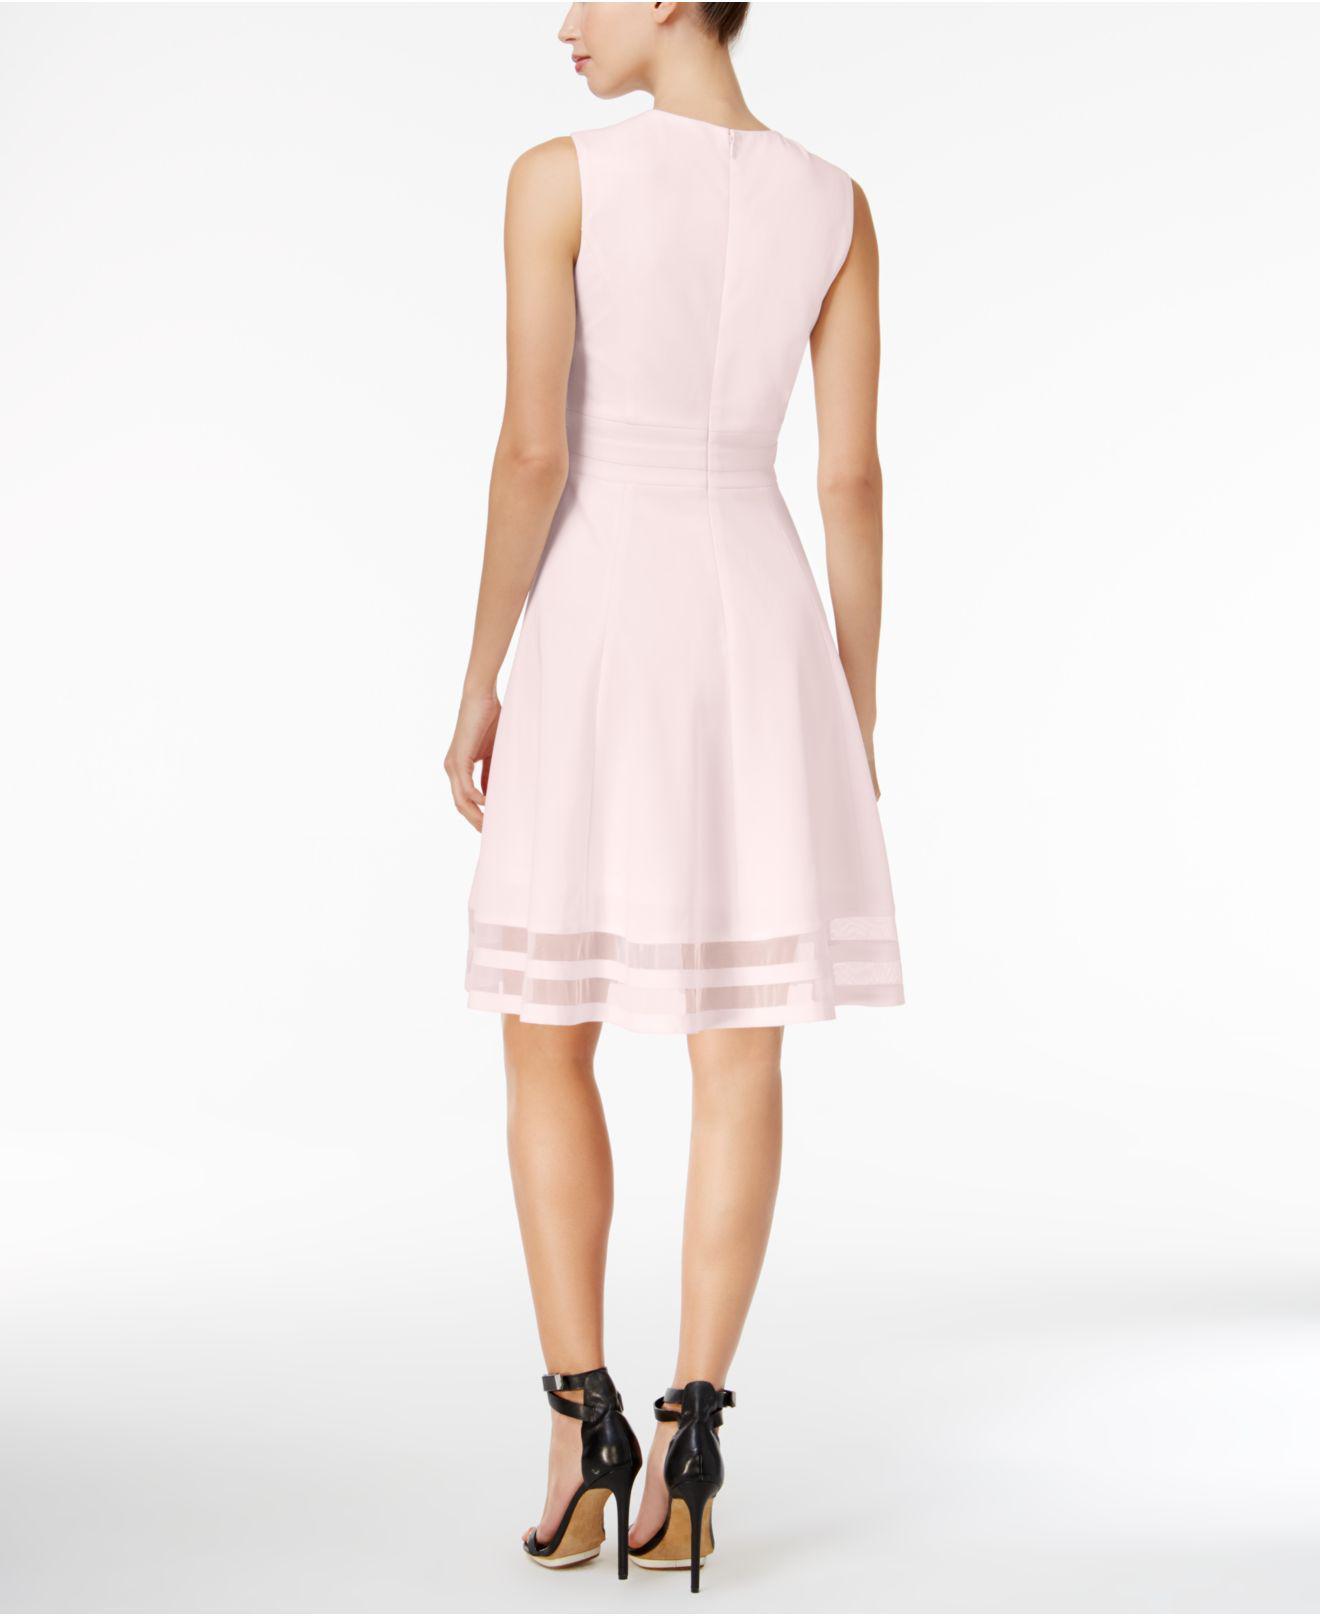 41e5e098a95 Calvin Klein Illusion-trim Fit   Flare Dress in Pink - Lyst